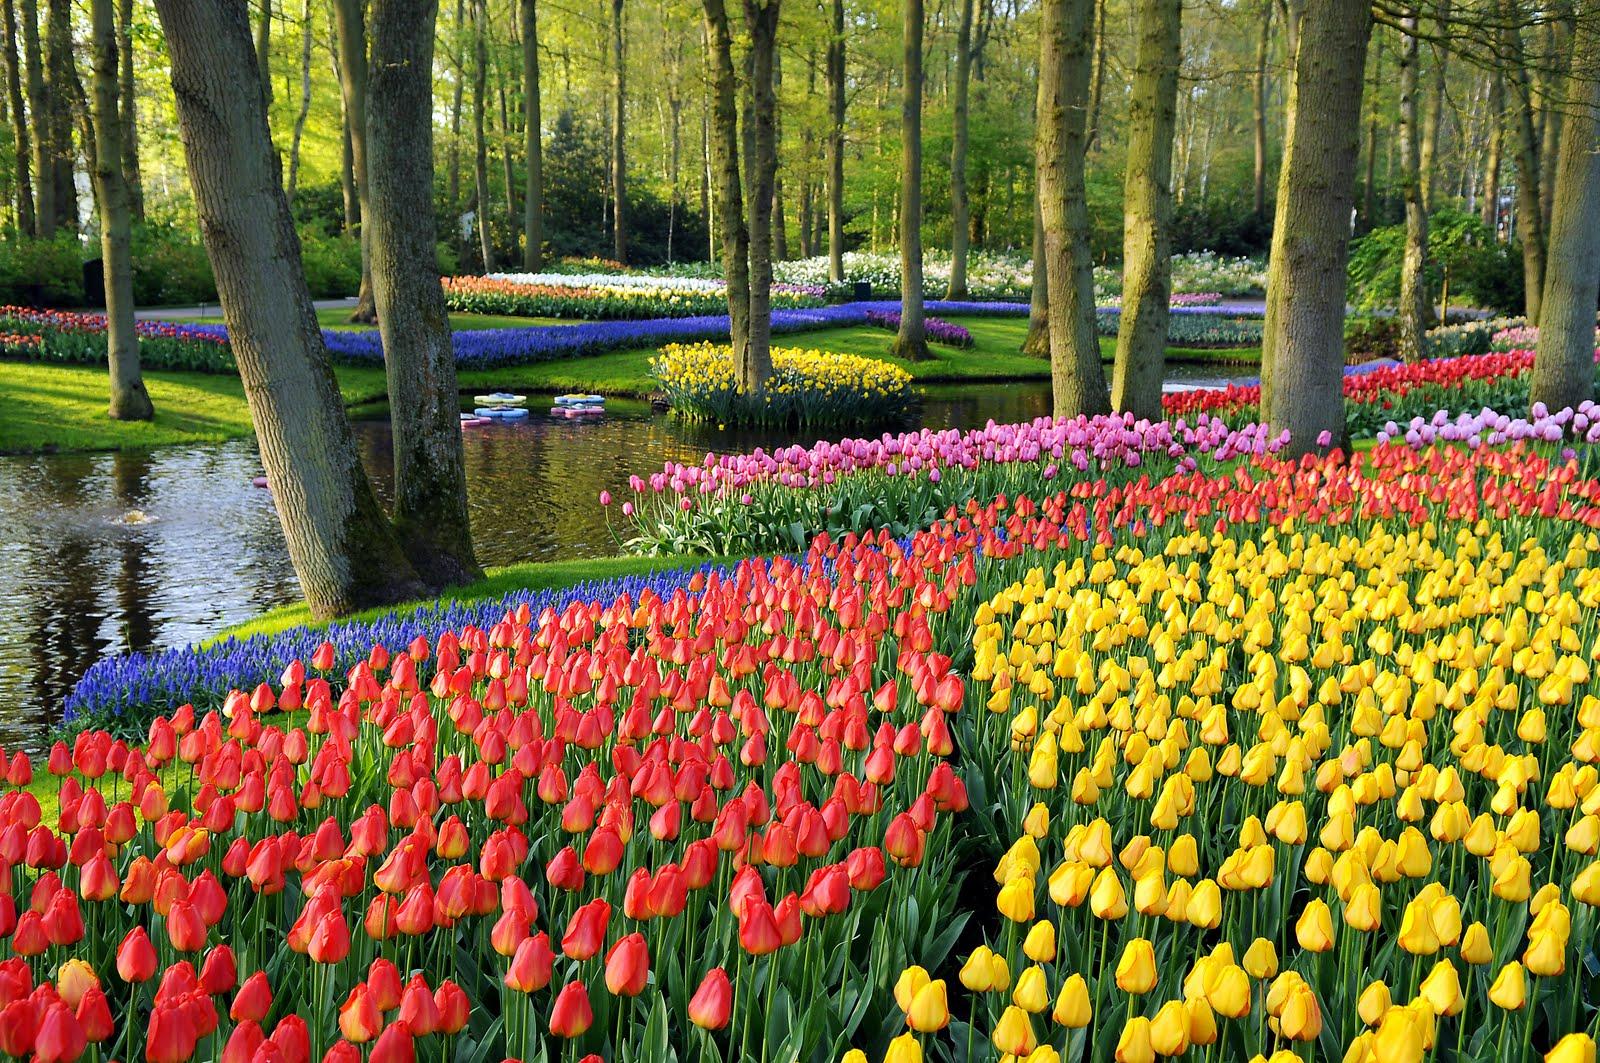 kukyflor los jardines m s famosos del mundo